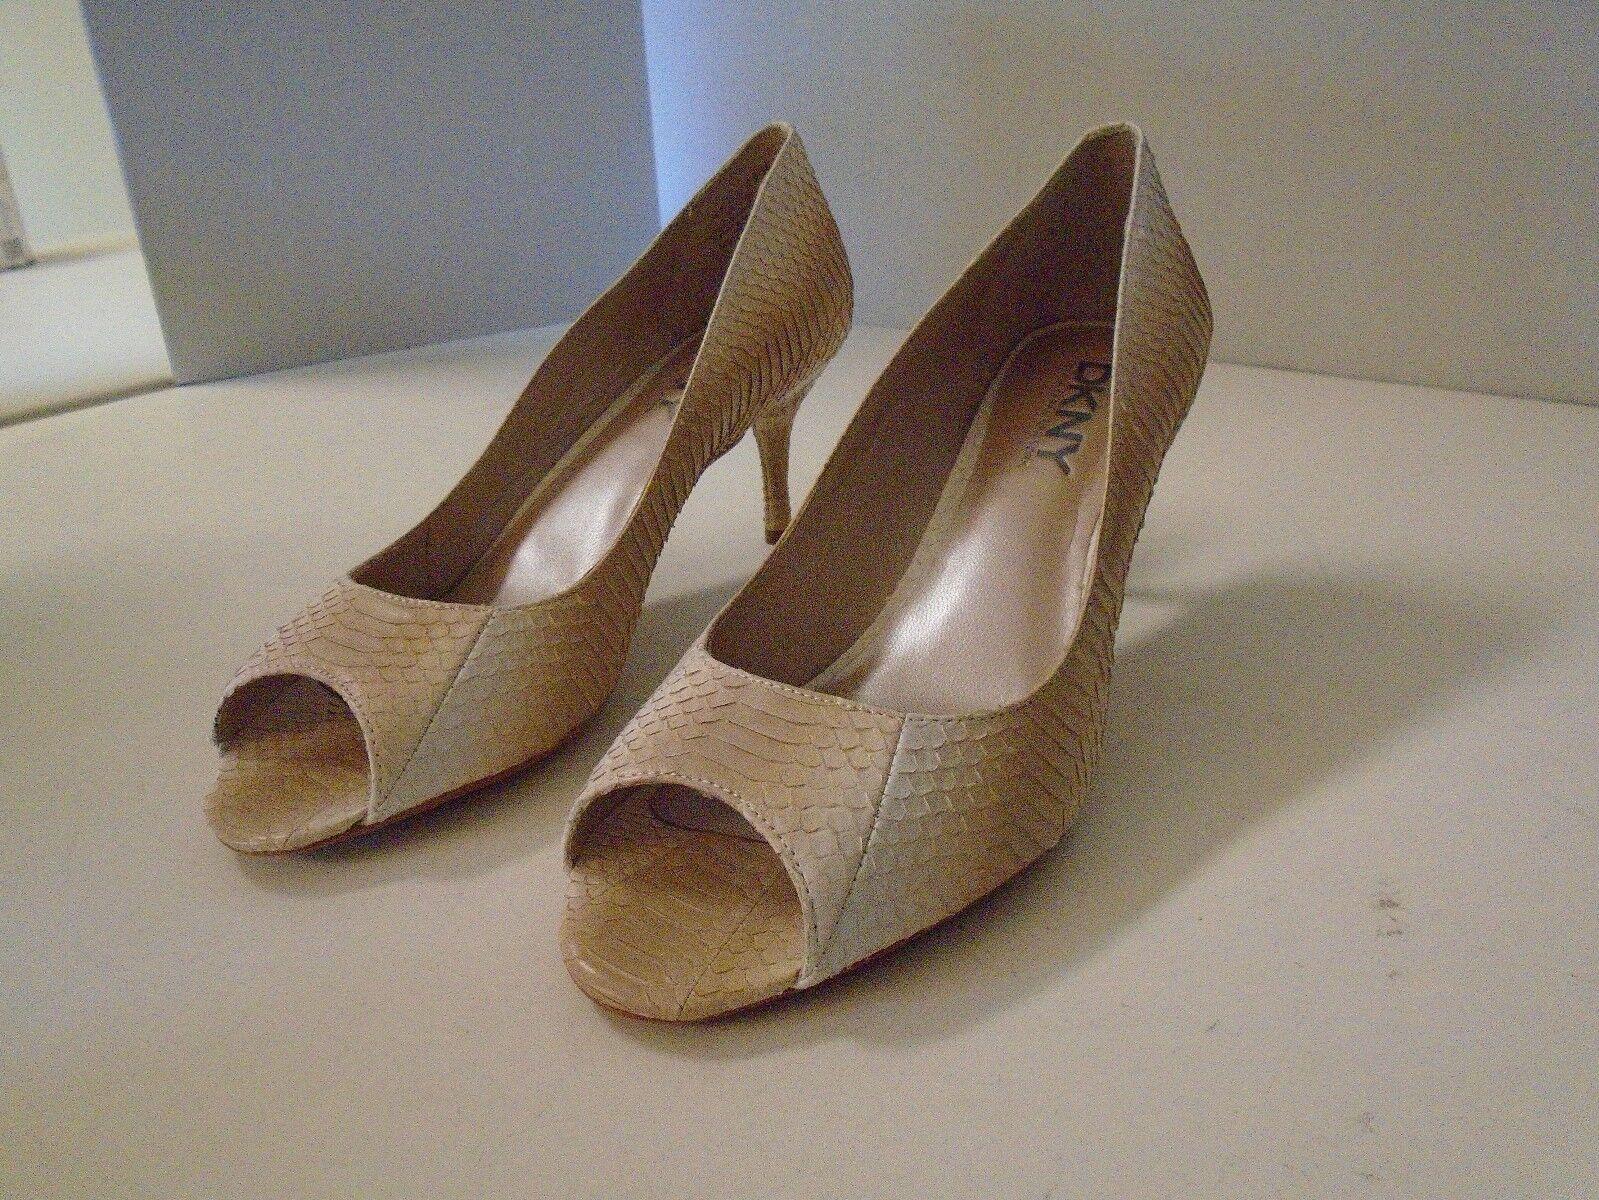 DKNY Joni Bleached Snake Natural  8 1 2 M New Peep Toe Classic Pump Heel scarpe  basta comprarlo